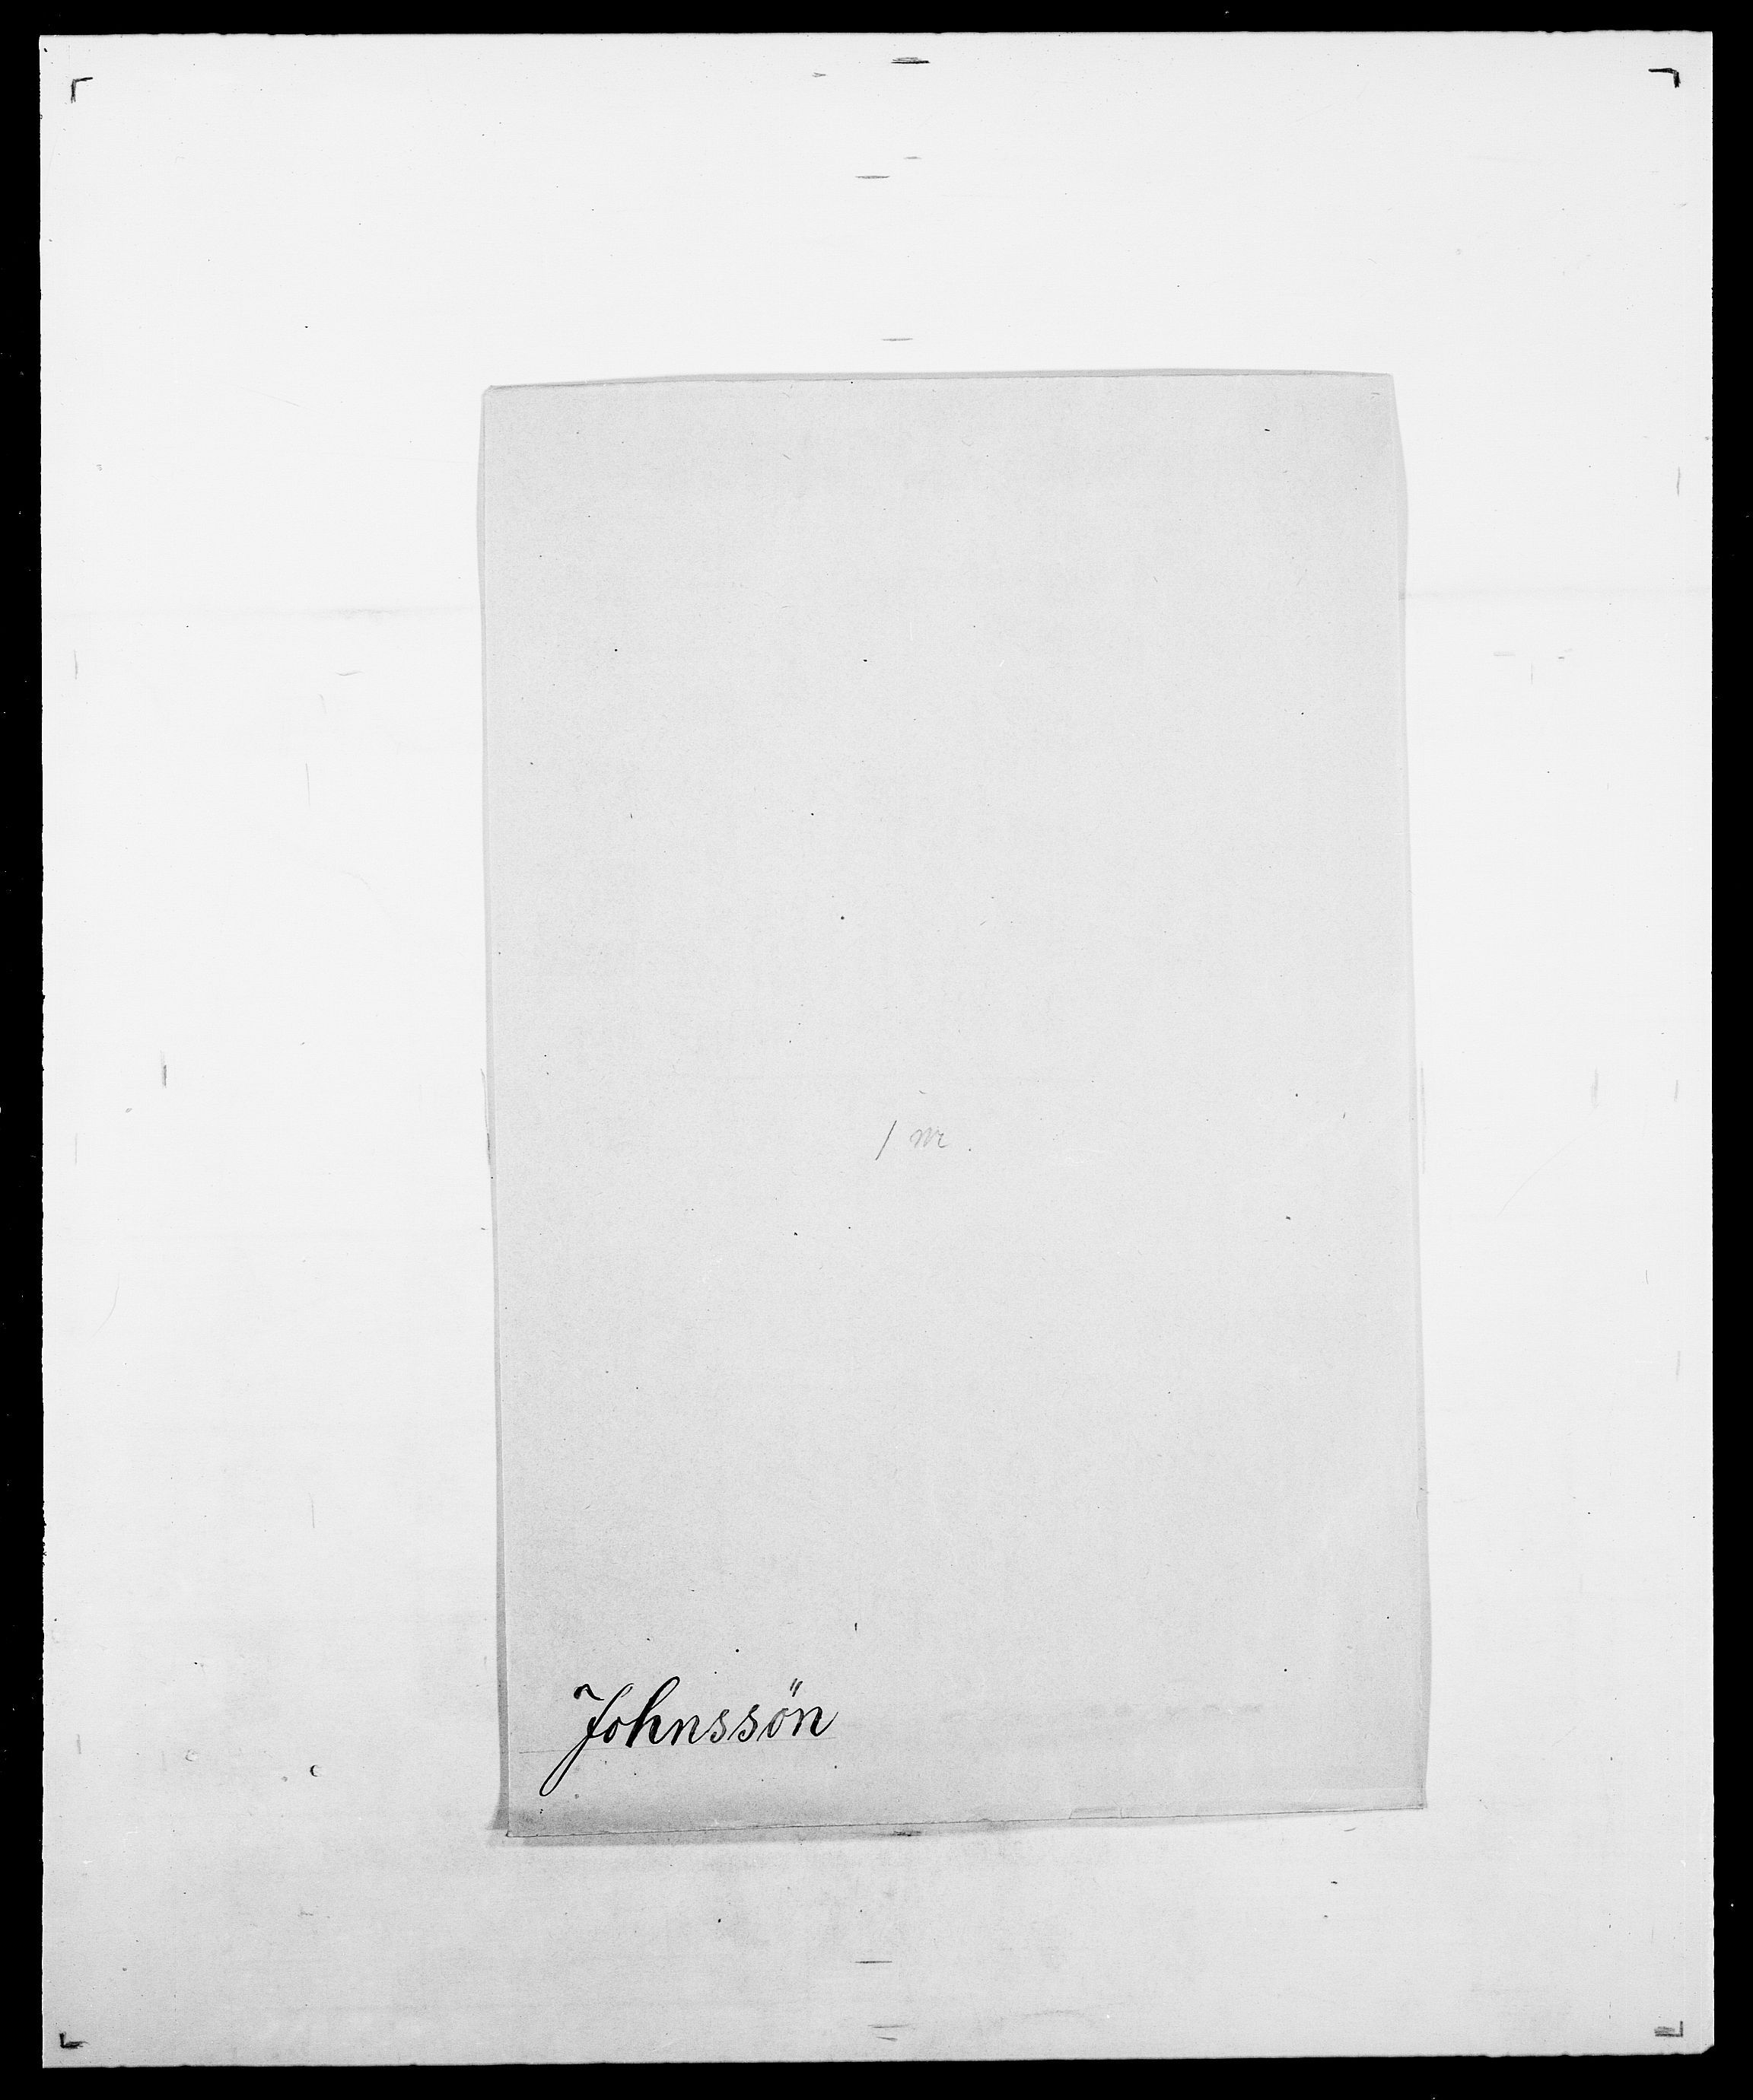 SAO, Delgobe, Charles Antoine - samling, D/Da/L0019: van der Hude - Joys, s. 873